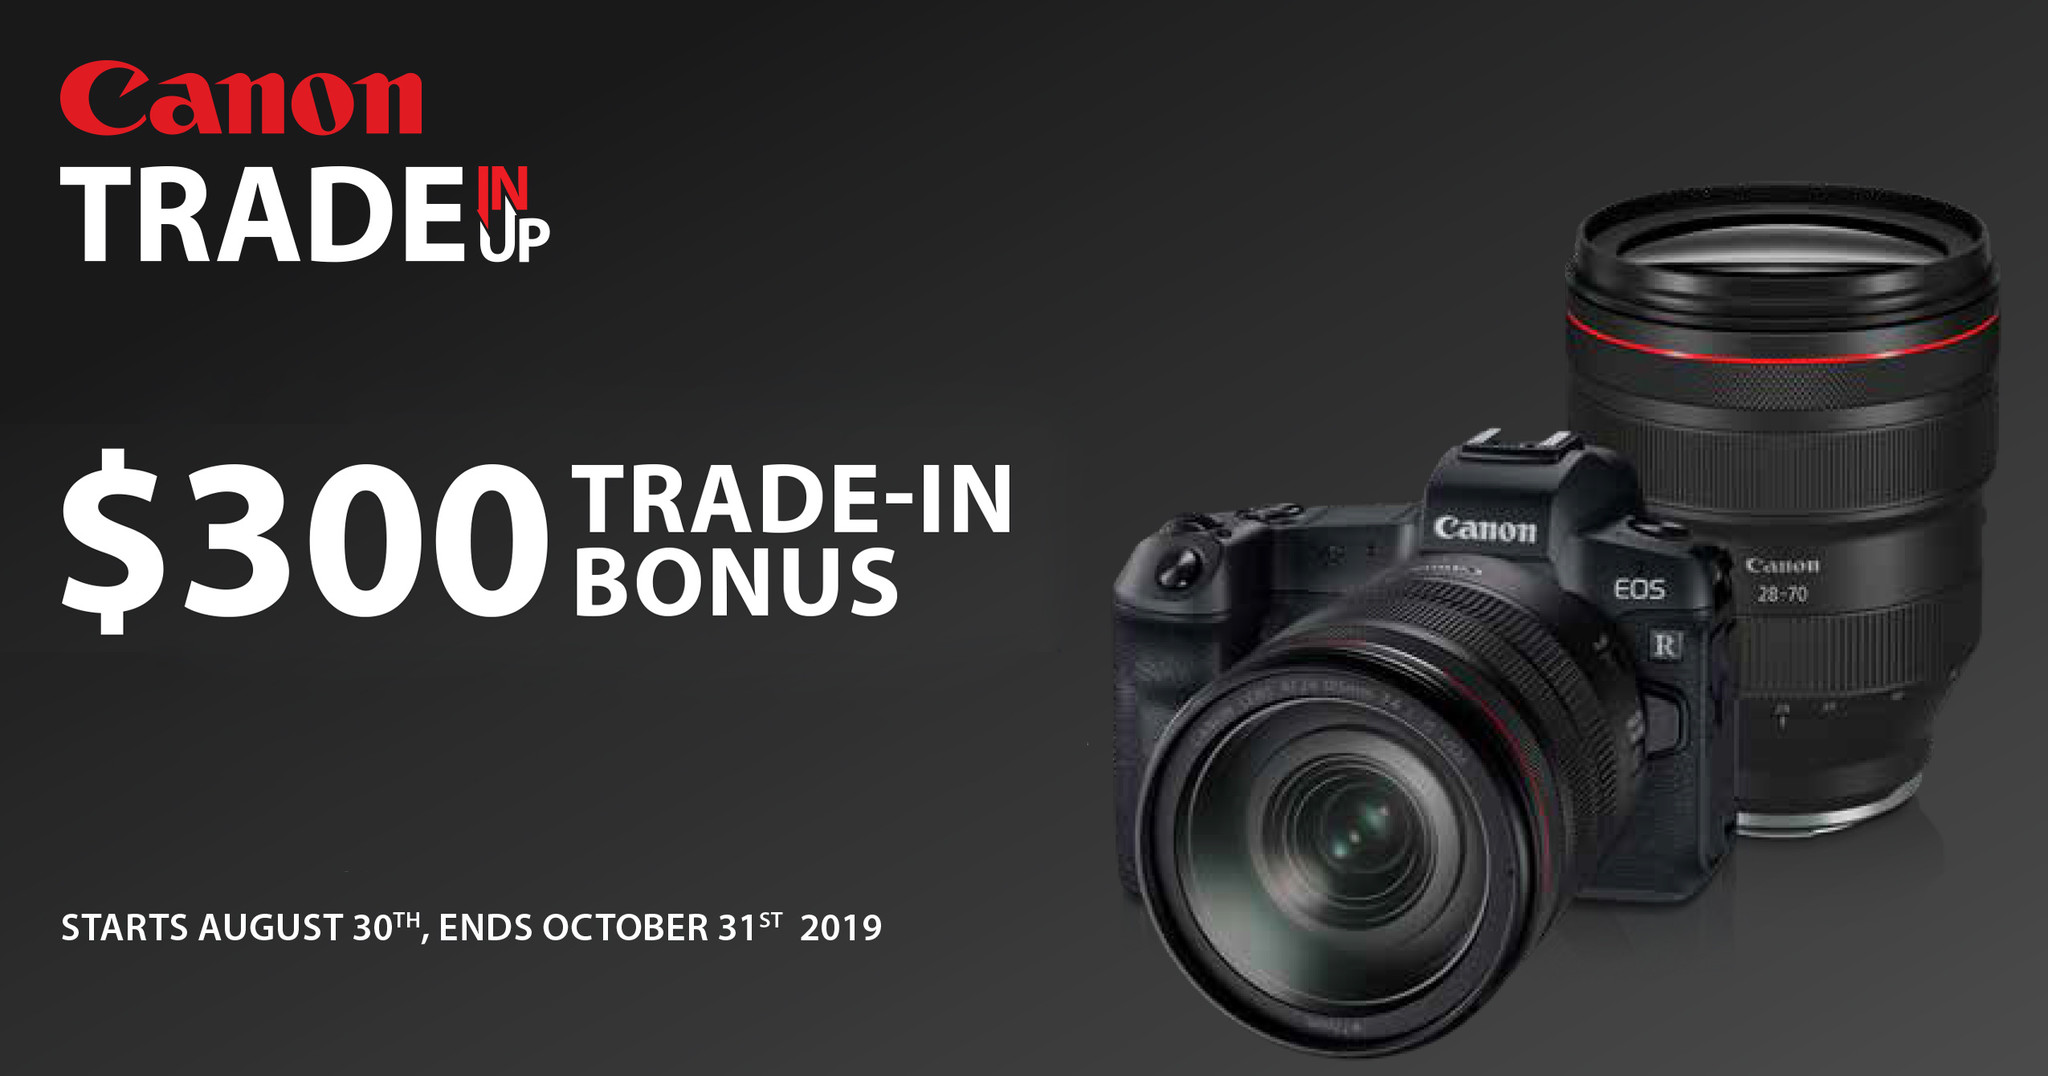 Canon Trade Up